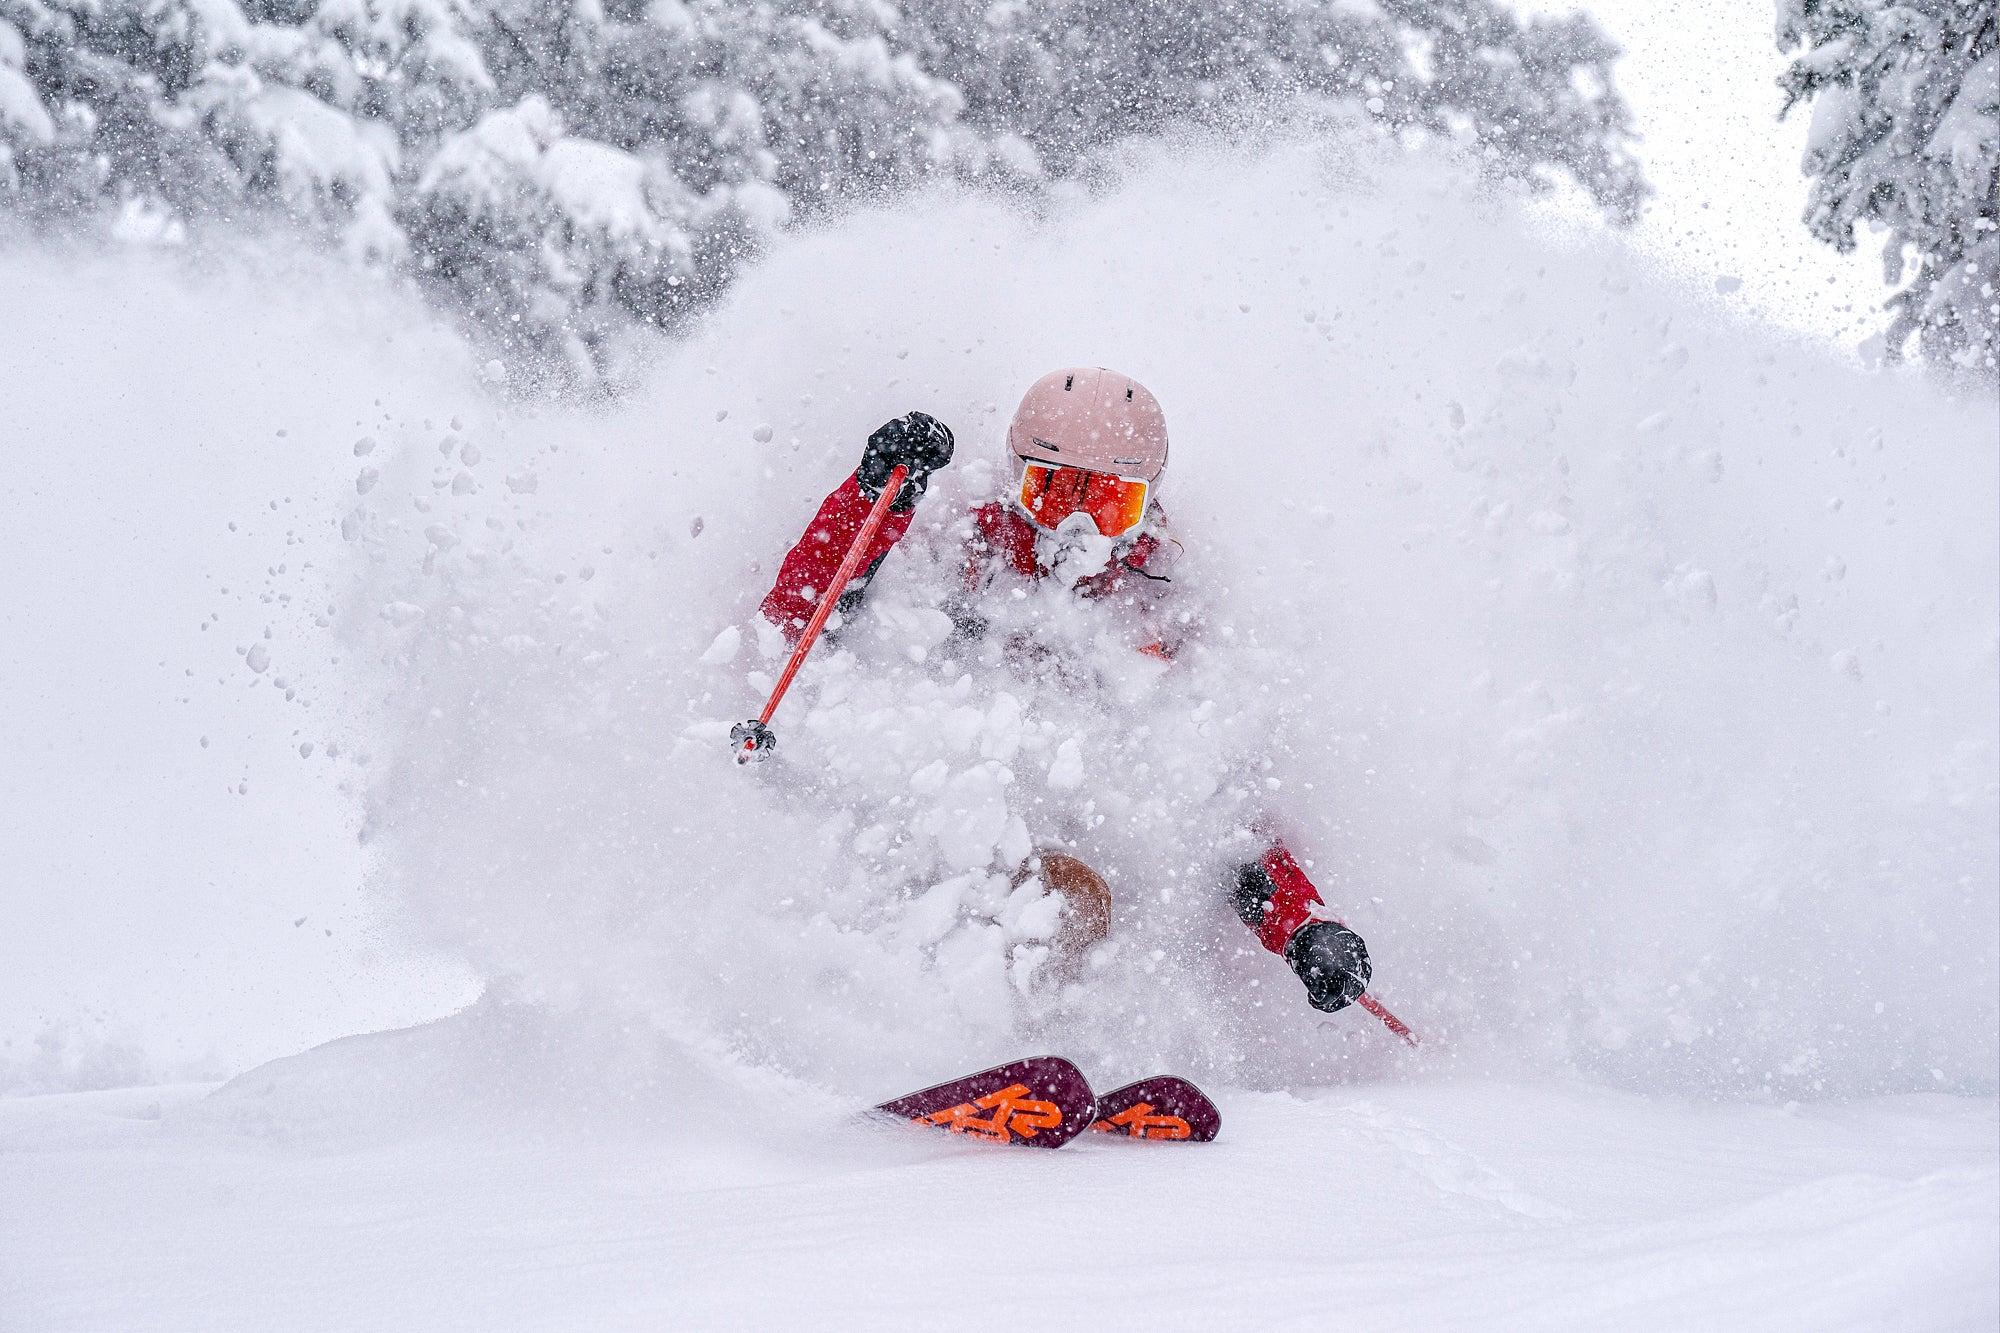 Amie Engerbretson at Taos Ski Valley, NM